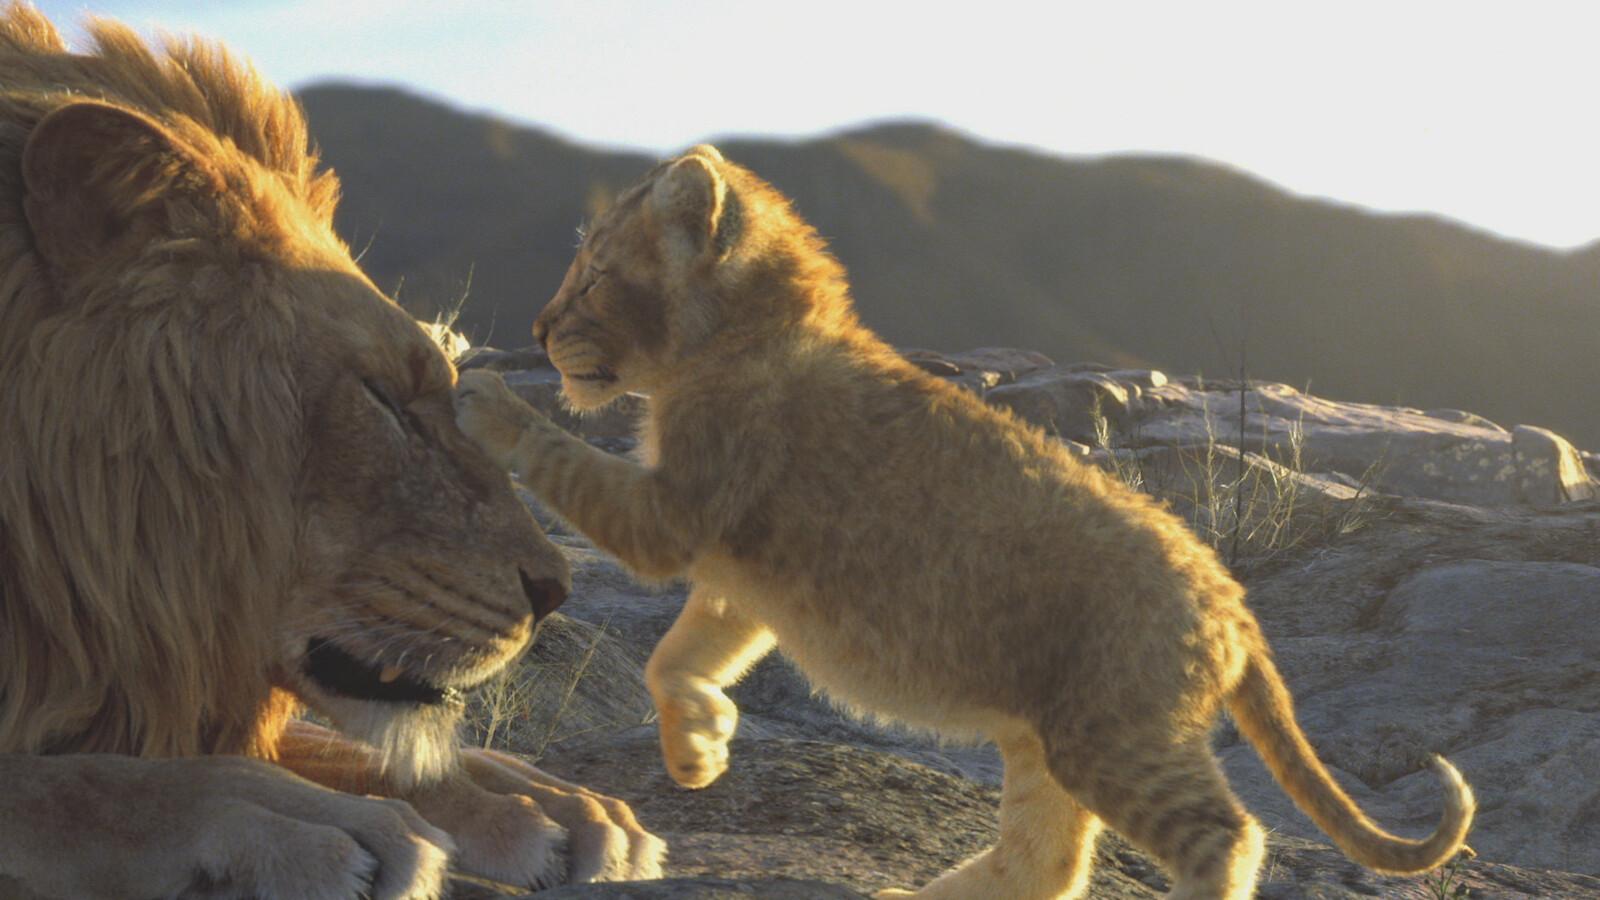 The playful cub